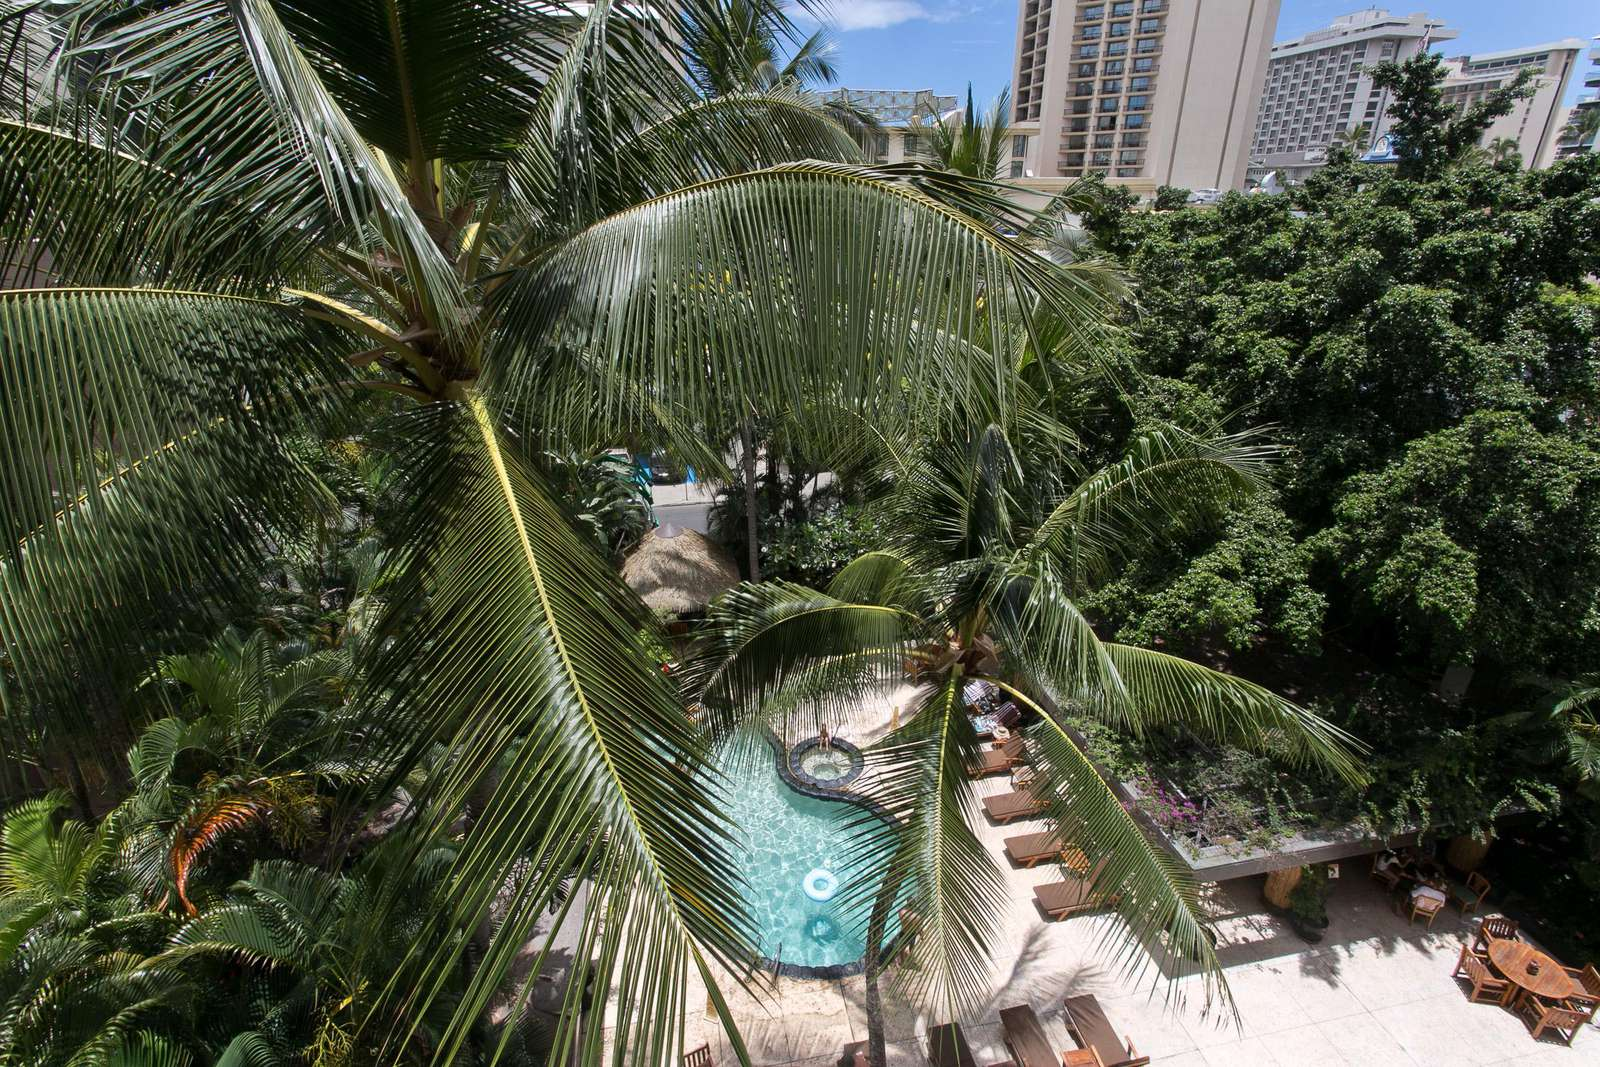 The Bamboo Hotel's lush pool area